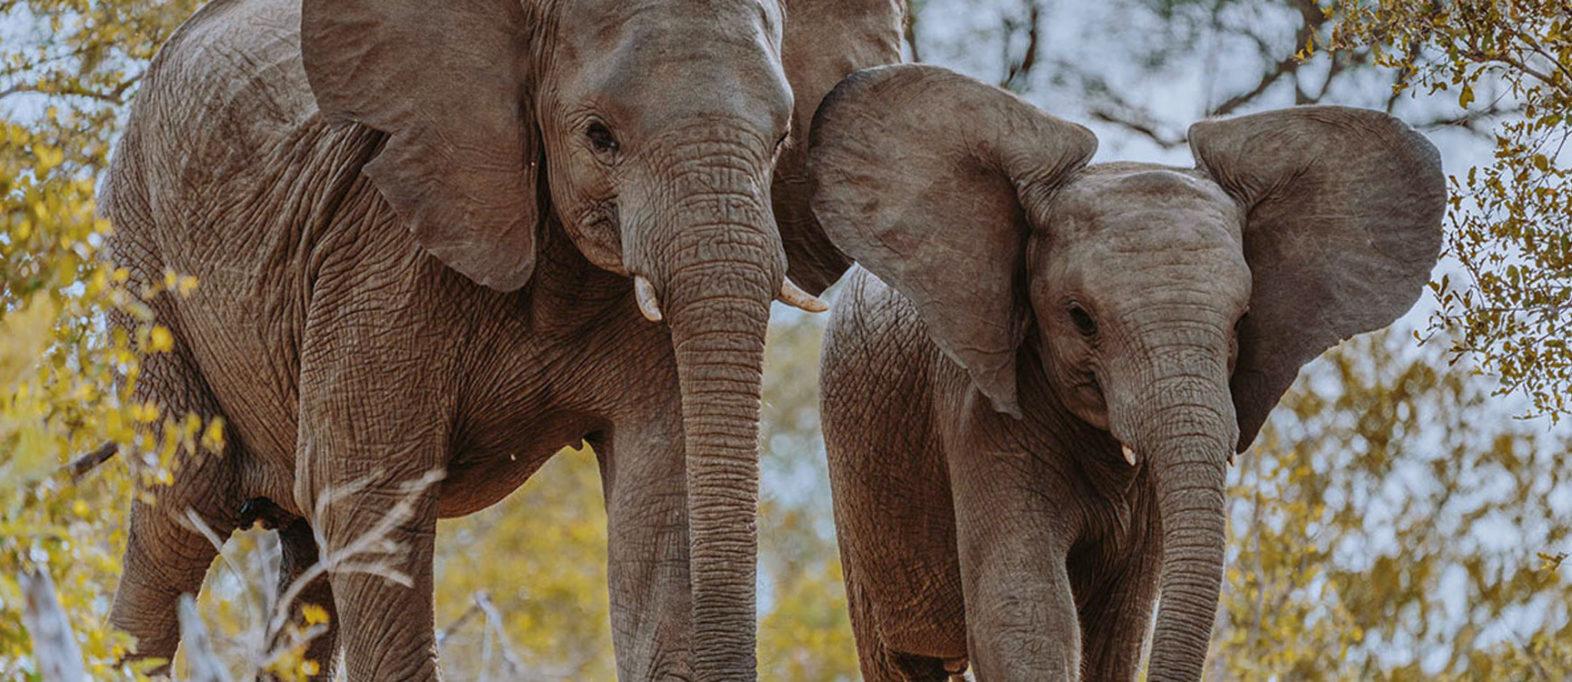 Elefanten im Krüger Nationalpark (Klaserie)